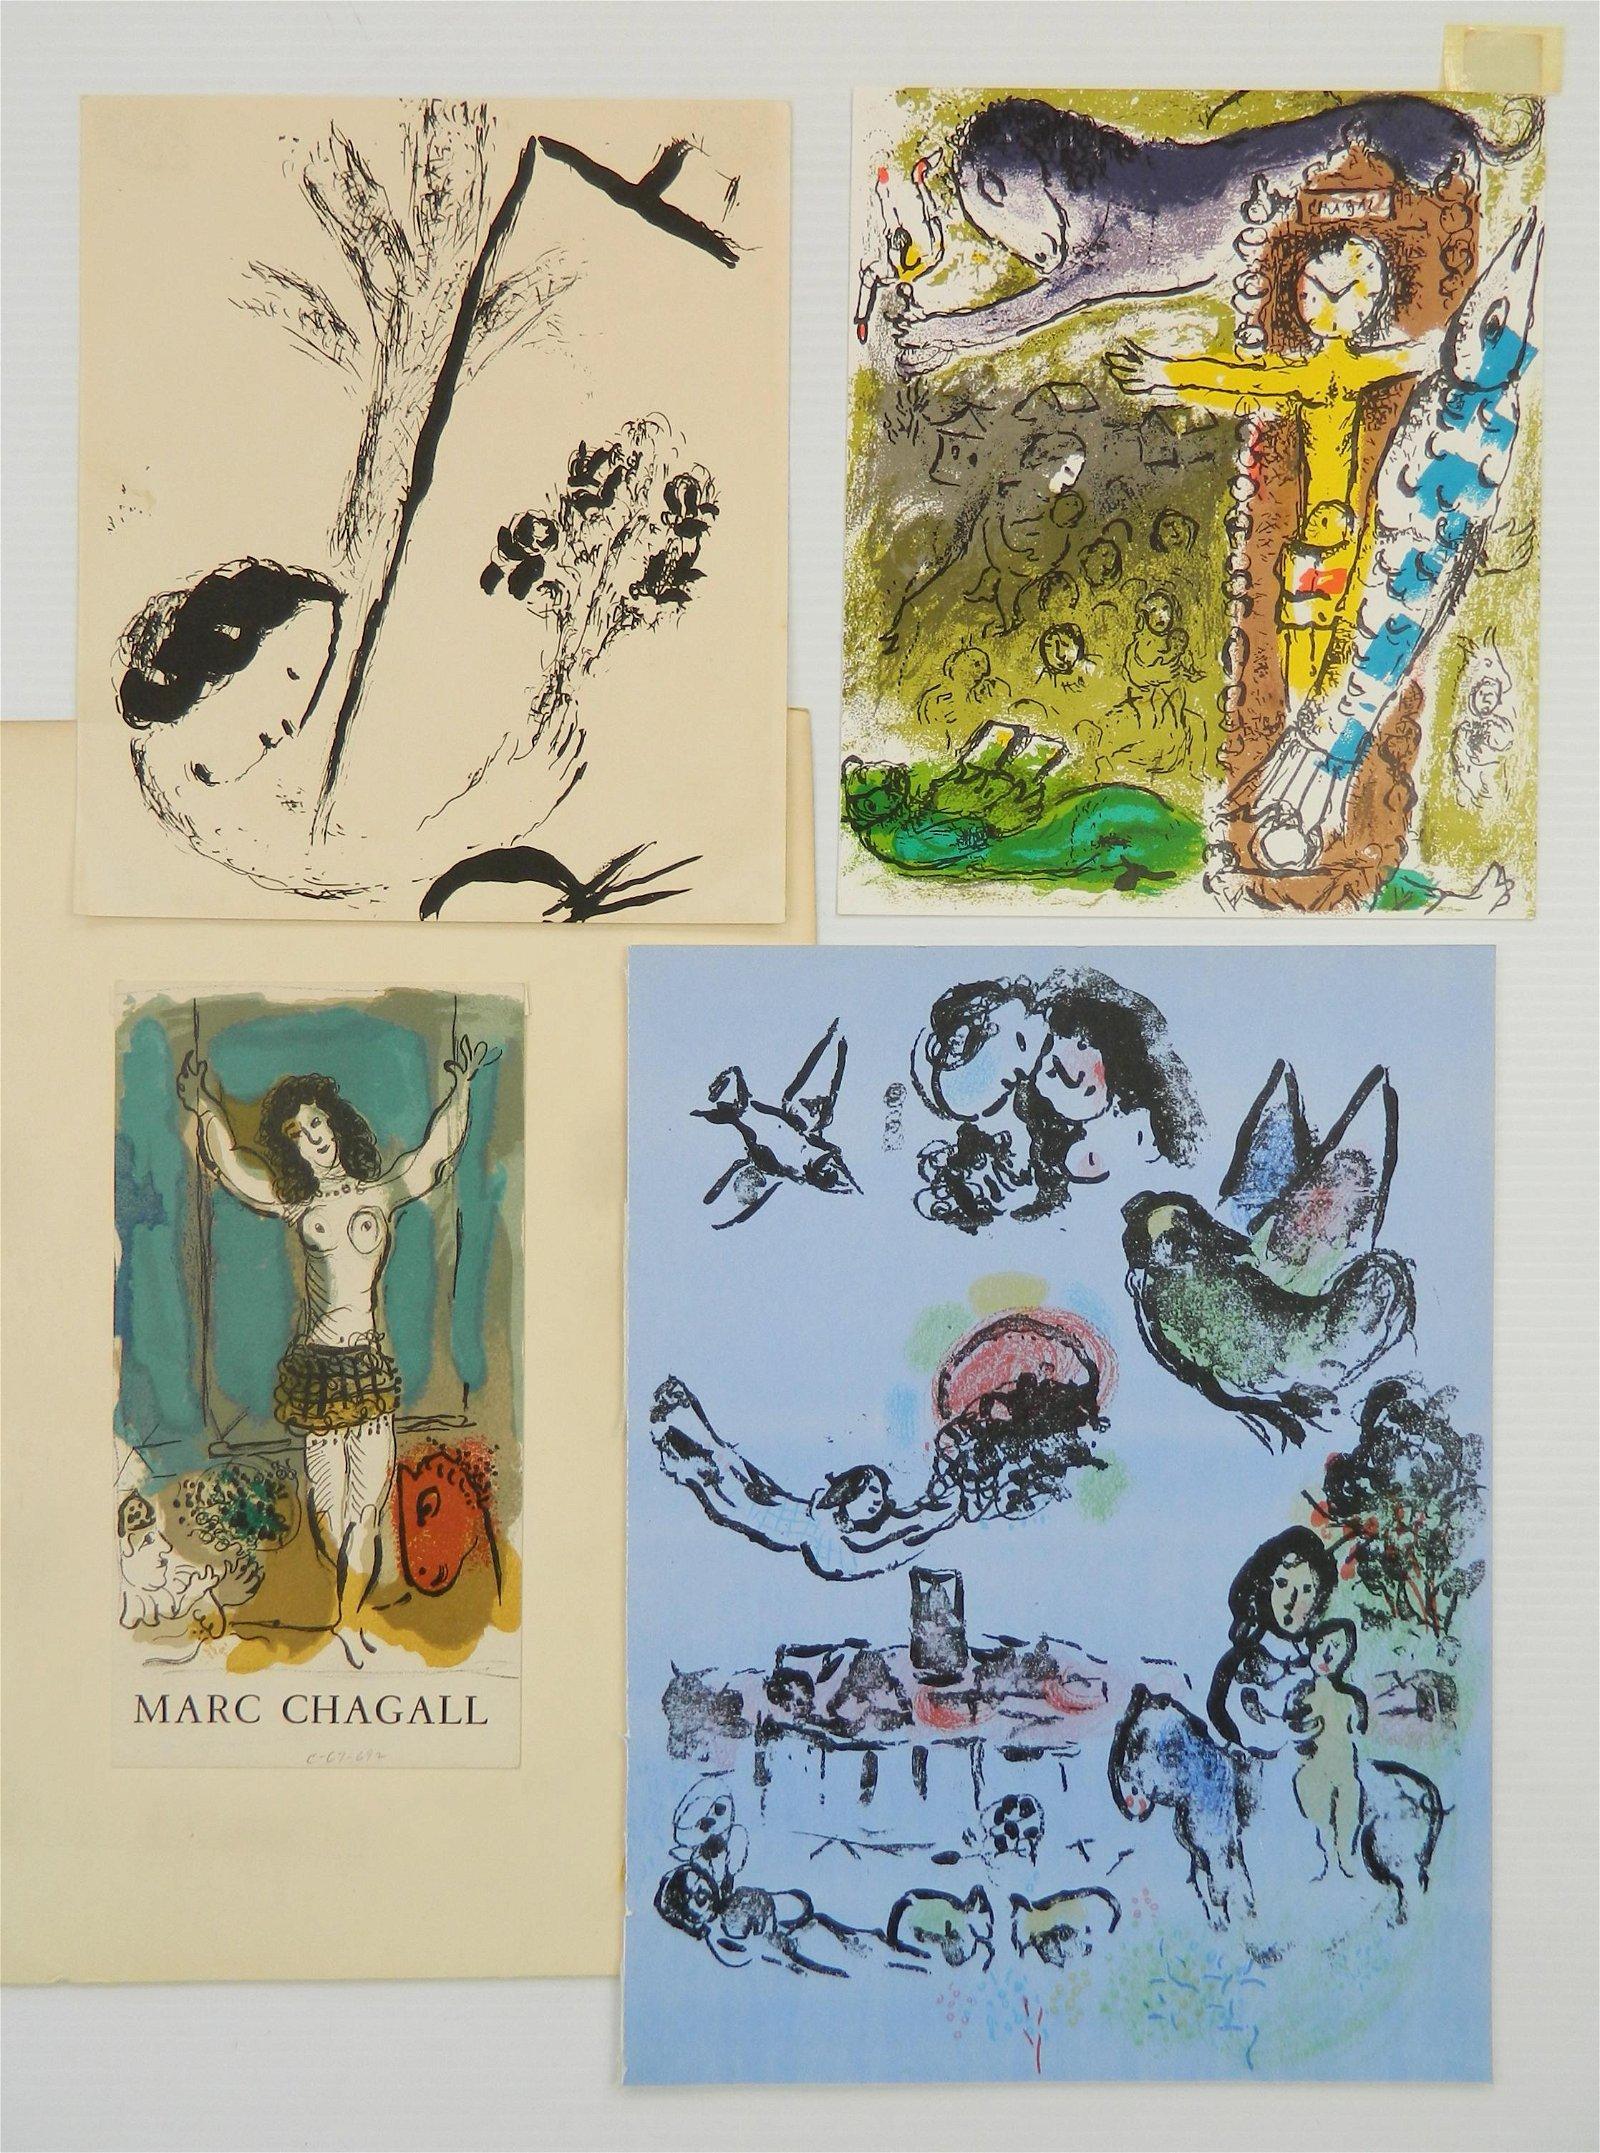 4 Marc Chagall lithographs